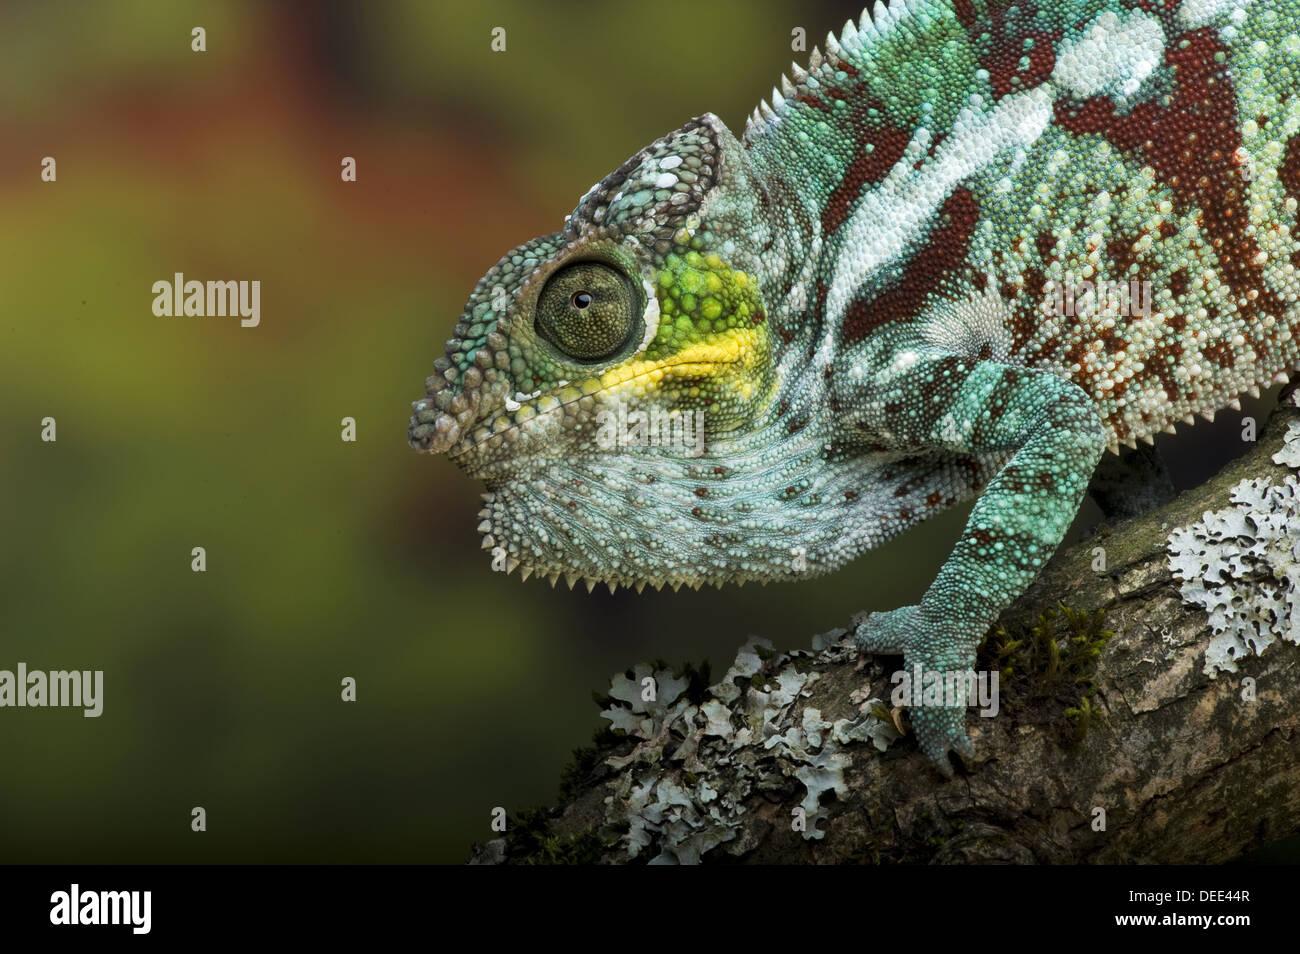 Pantherchamäleon (Furcifer pardalis) Stockbild